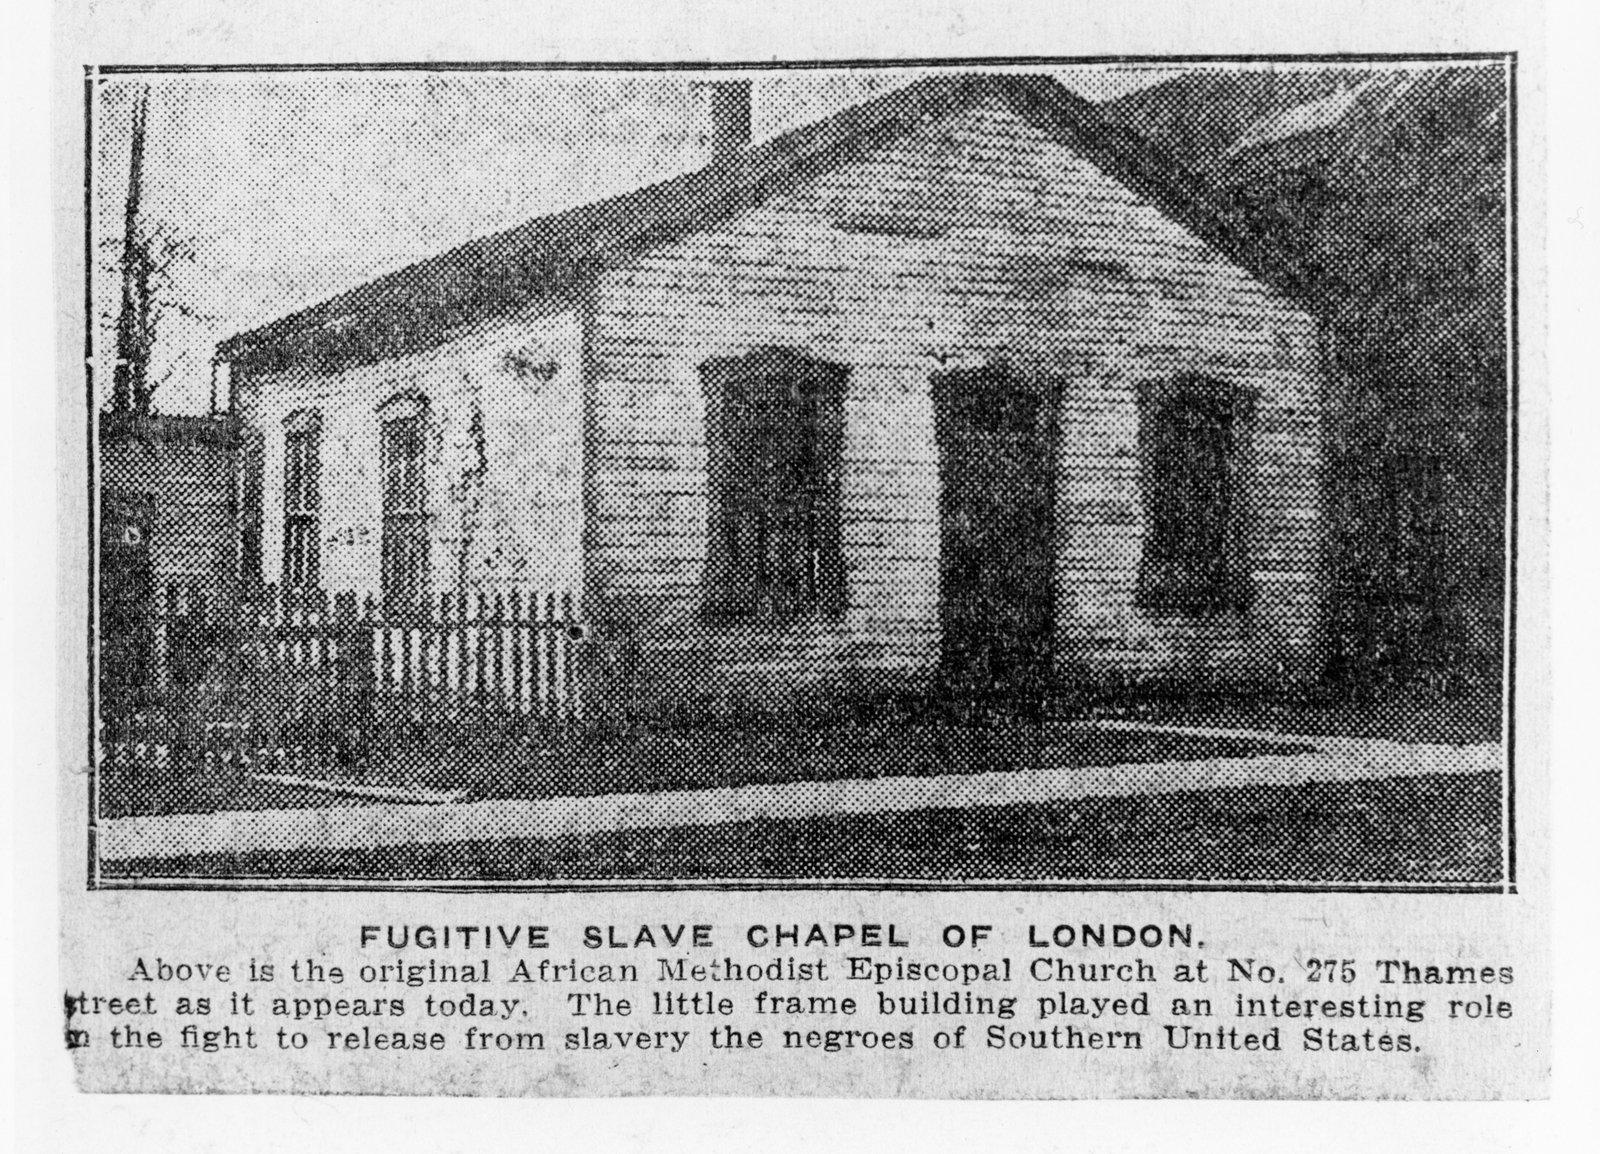 Full Image View Fugitive Slave Chapel London Ontario